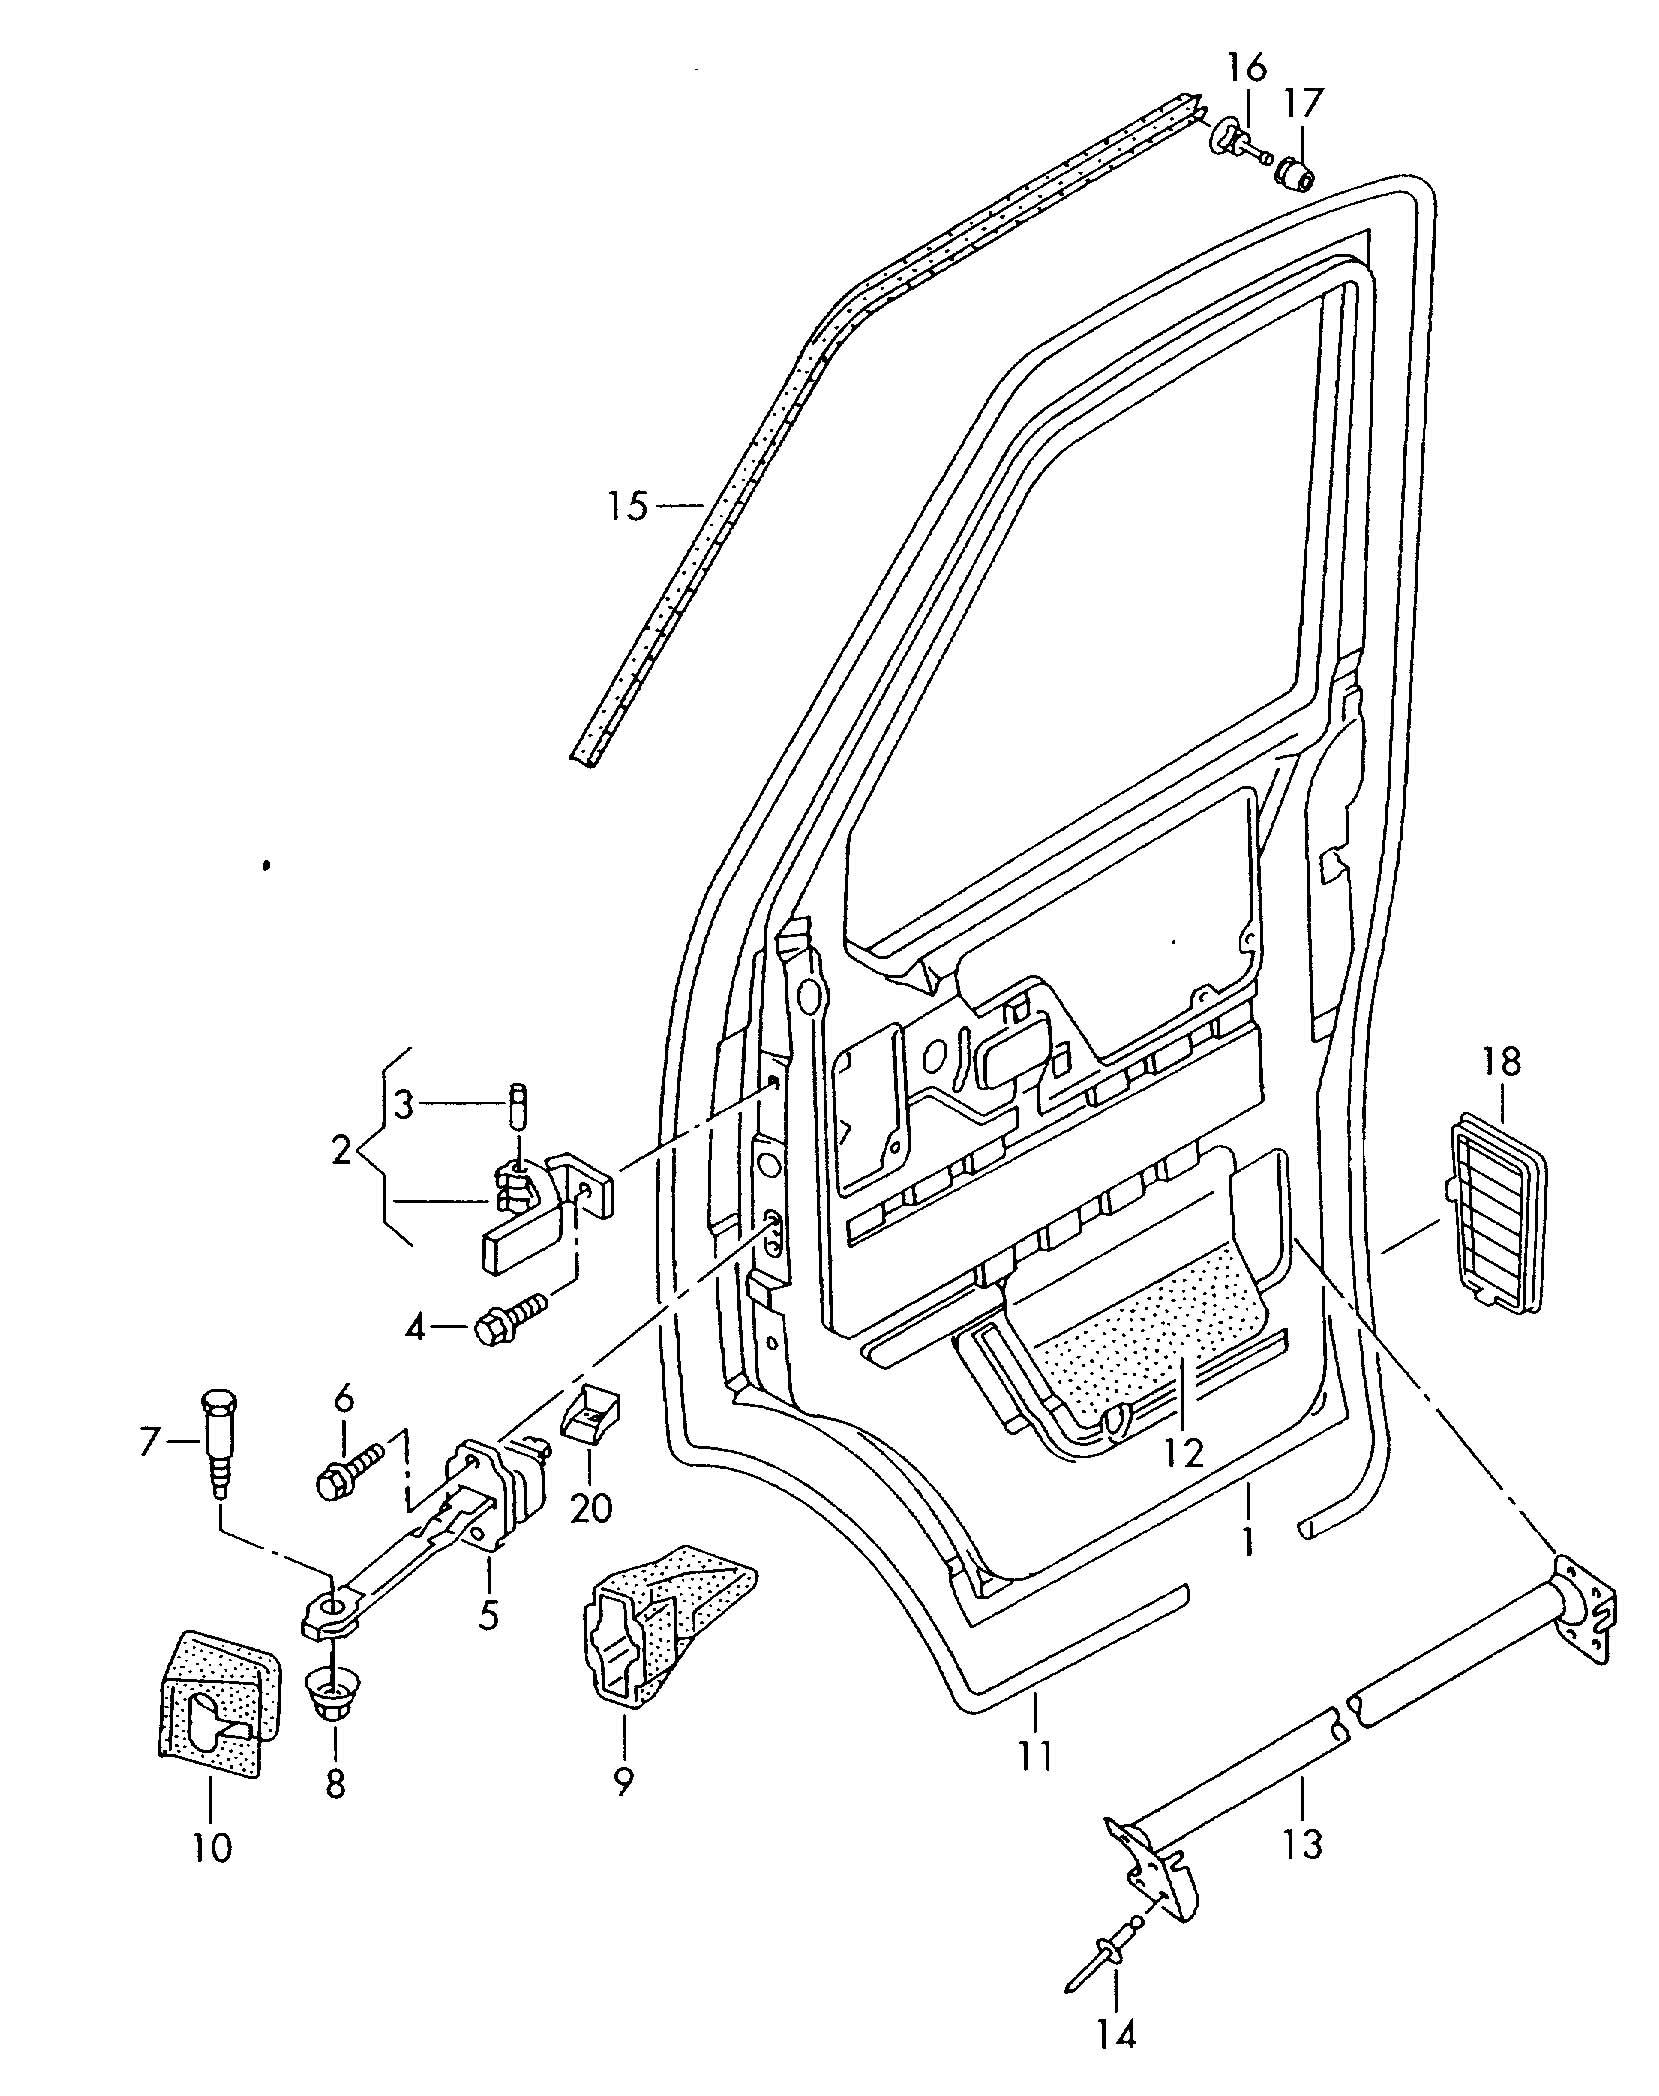 Vw t5 parts diagrams vw t5 parts diagrams volkswagen vw t4 wiring diagram